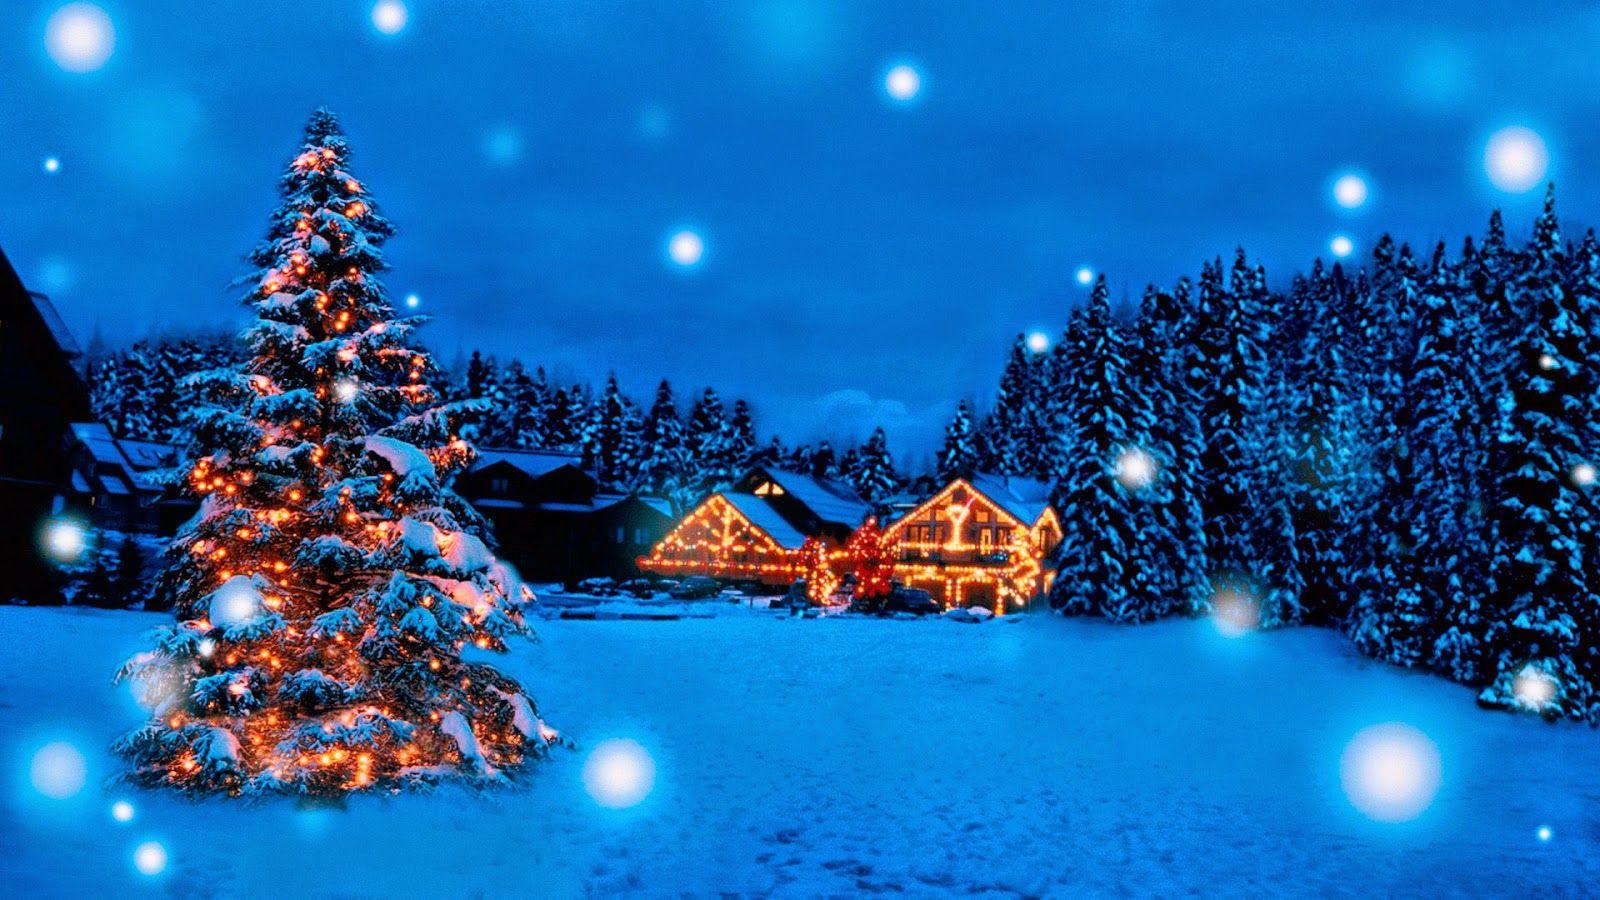 Christmas Desktop Wallpapers   Top Christmas Desktop 1600x900